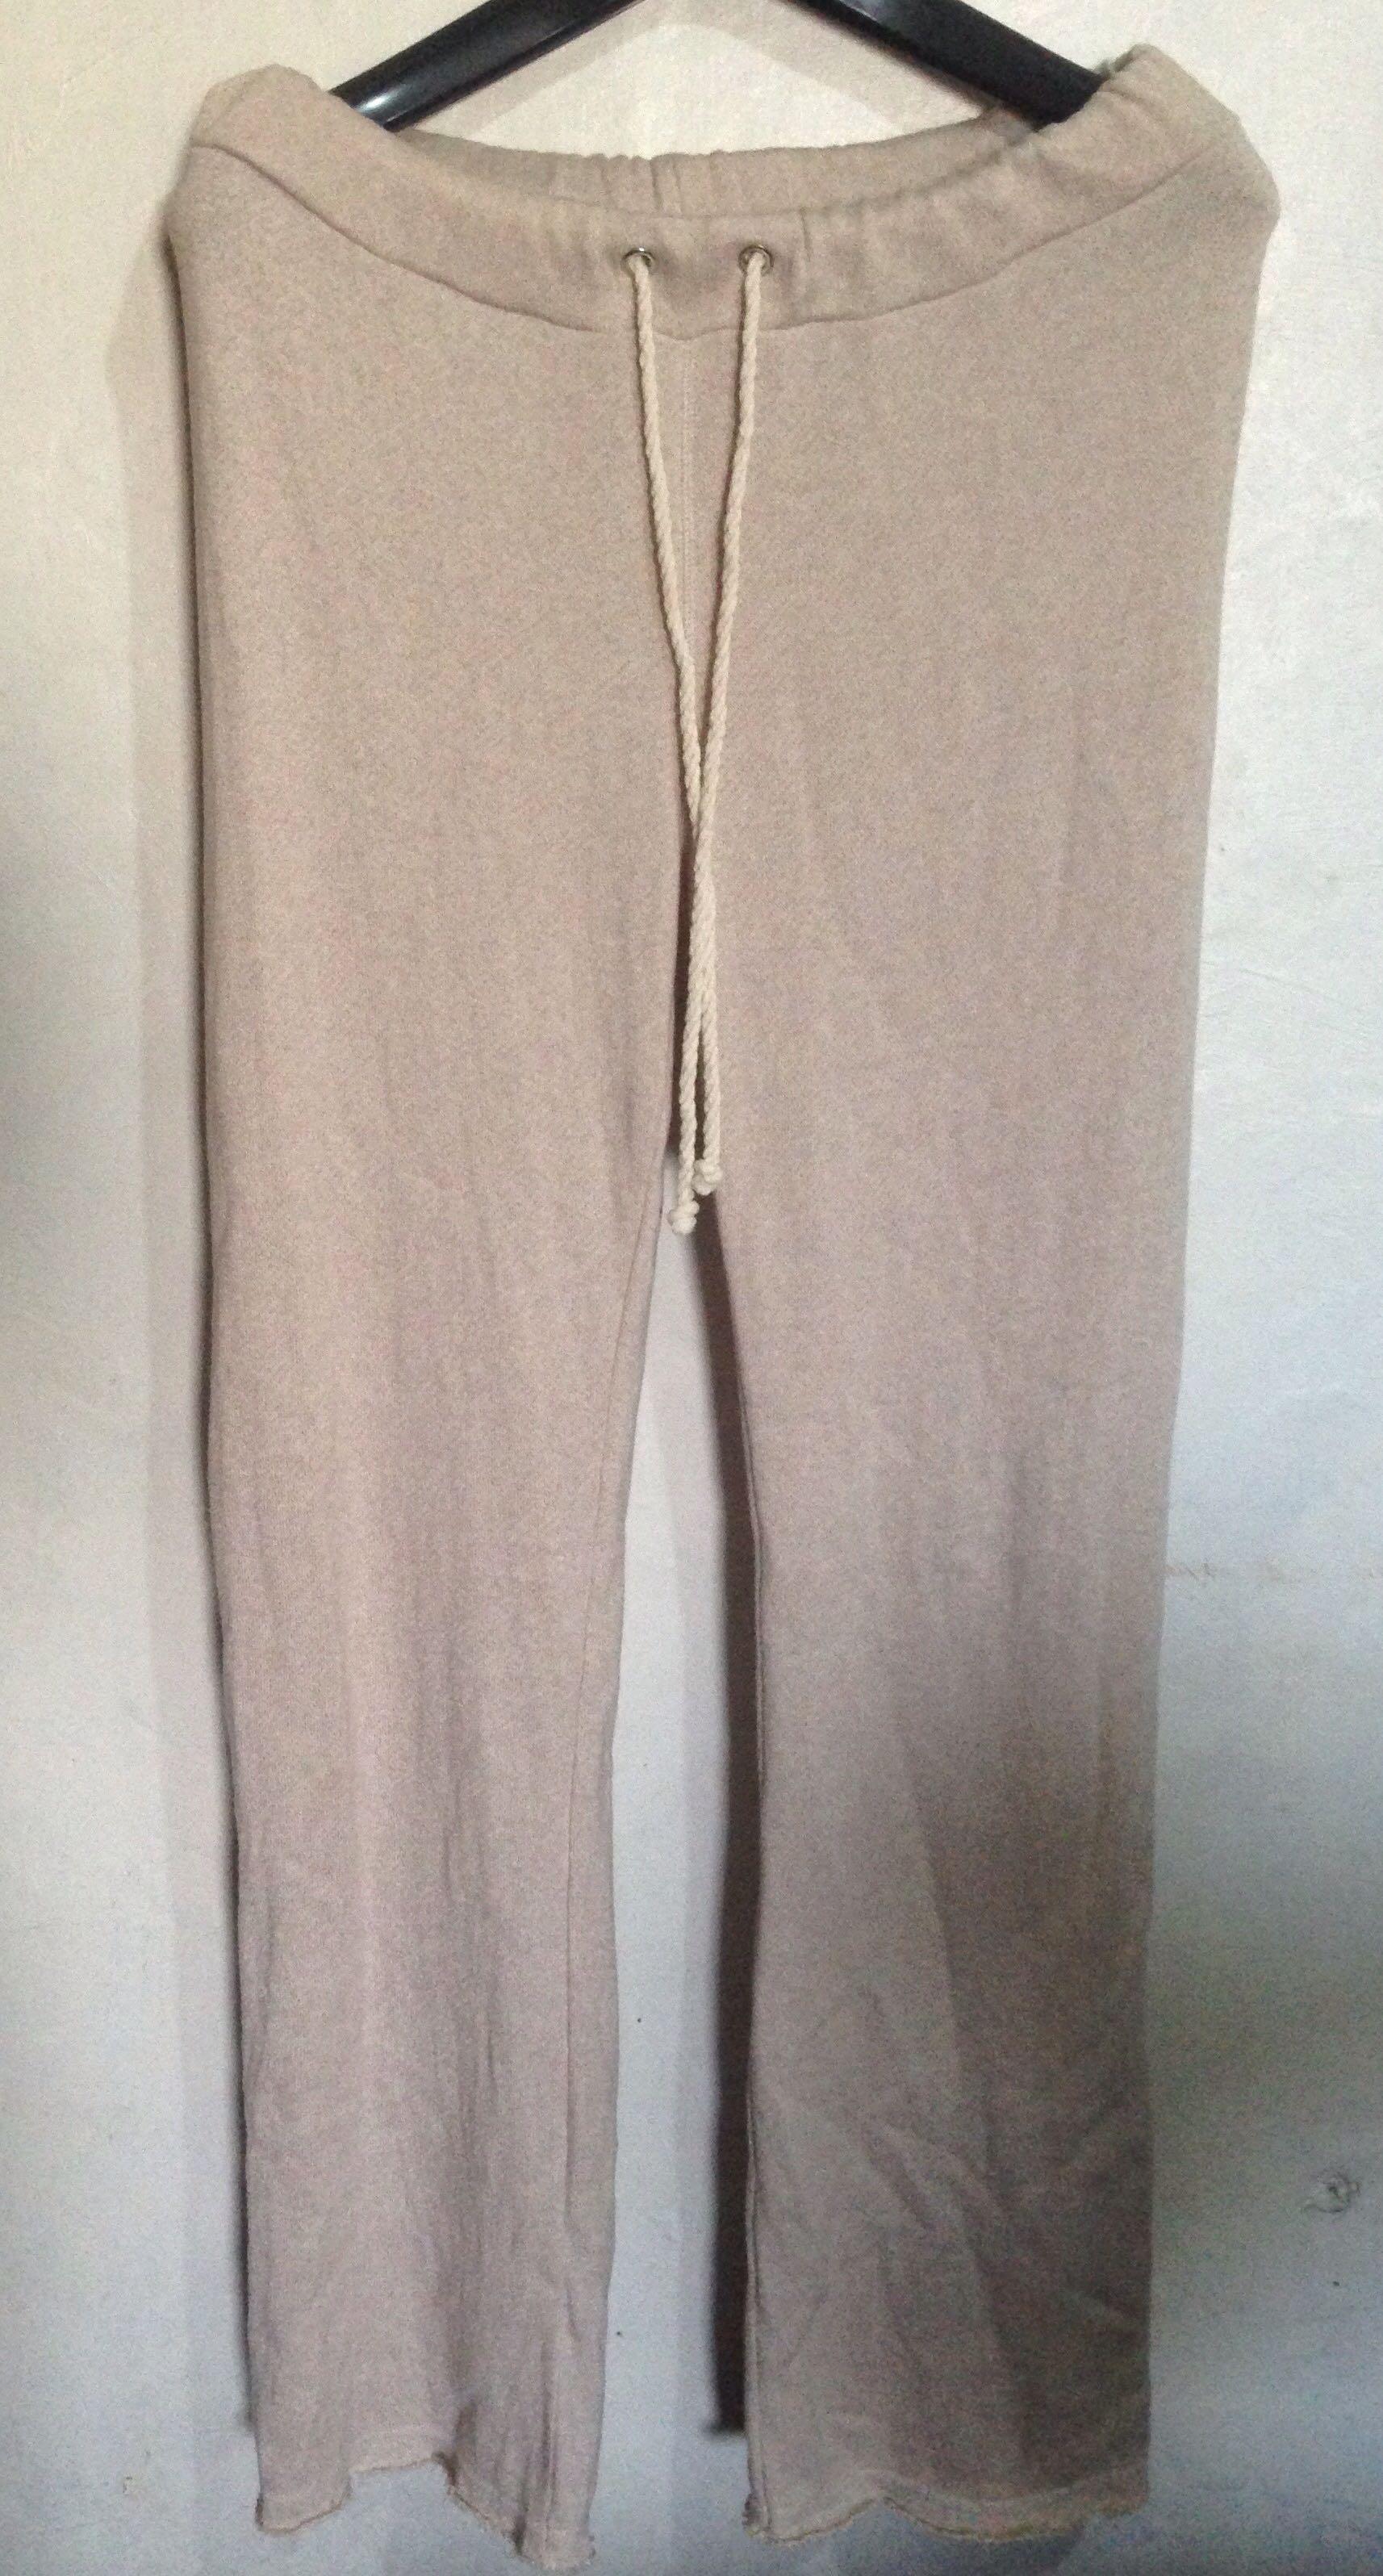 Victoria Secret Intimate Sleepwear Pajama